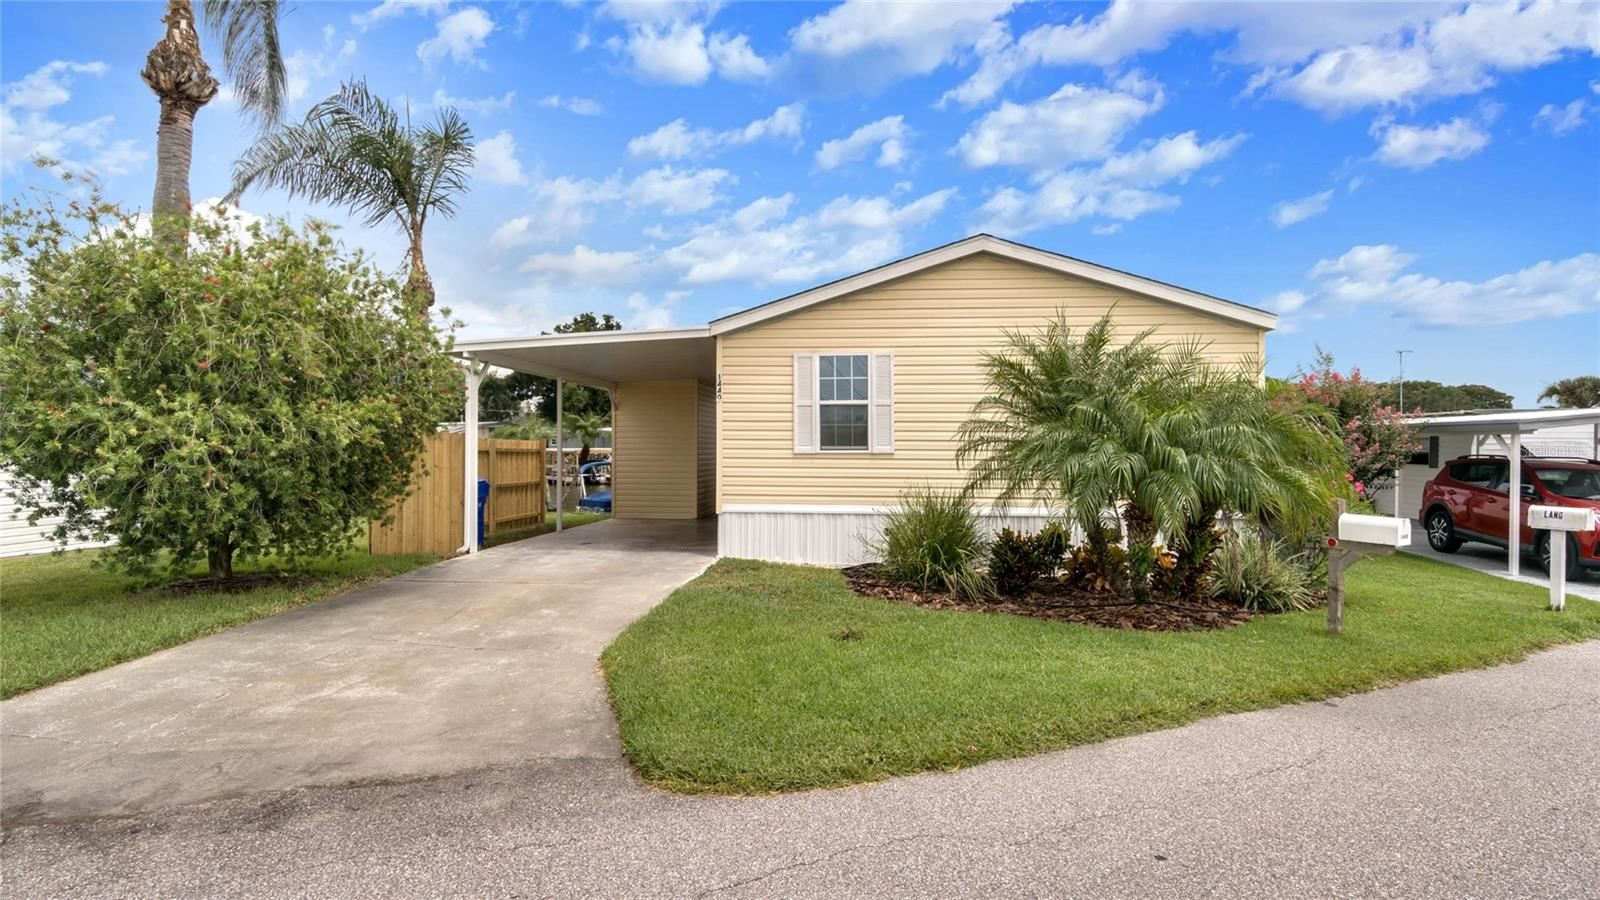 1440 SOUTHSHORE DRIVE, Tavares, FL 32778 - #: G5046159